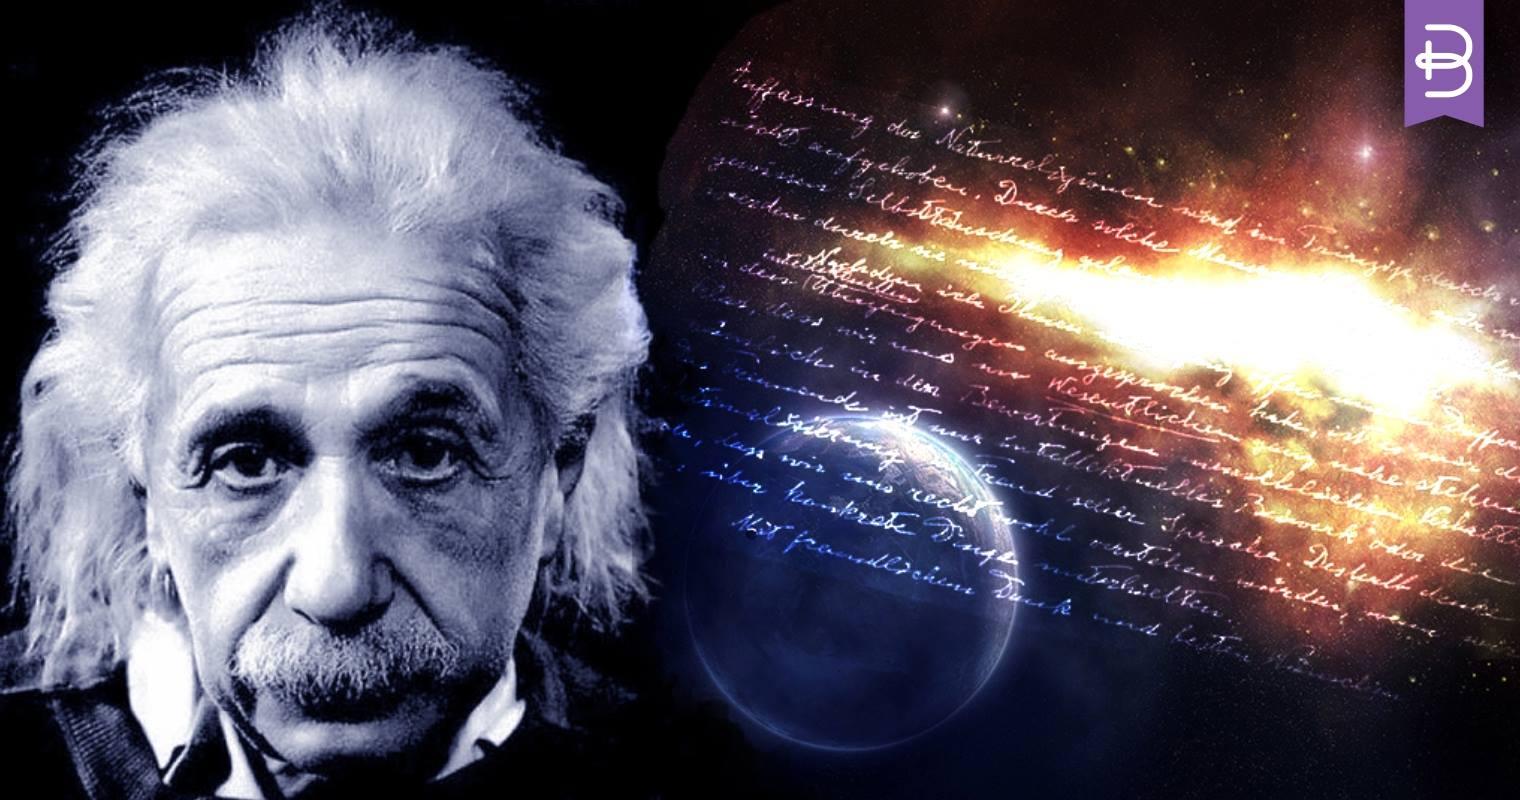 сняла фото на фоне эйнштейна раз наведите